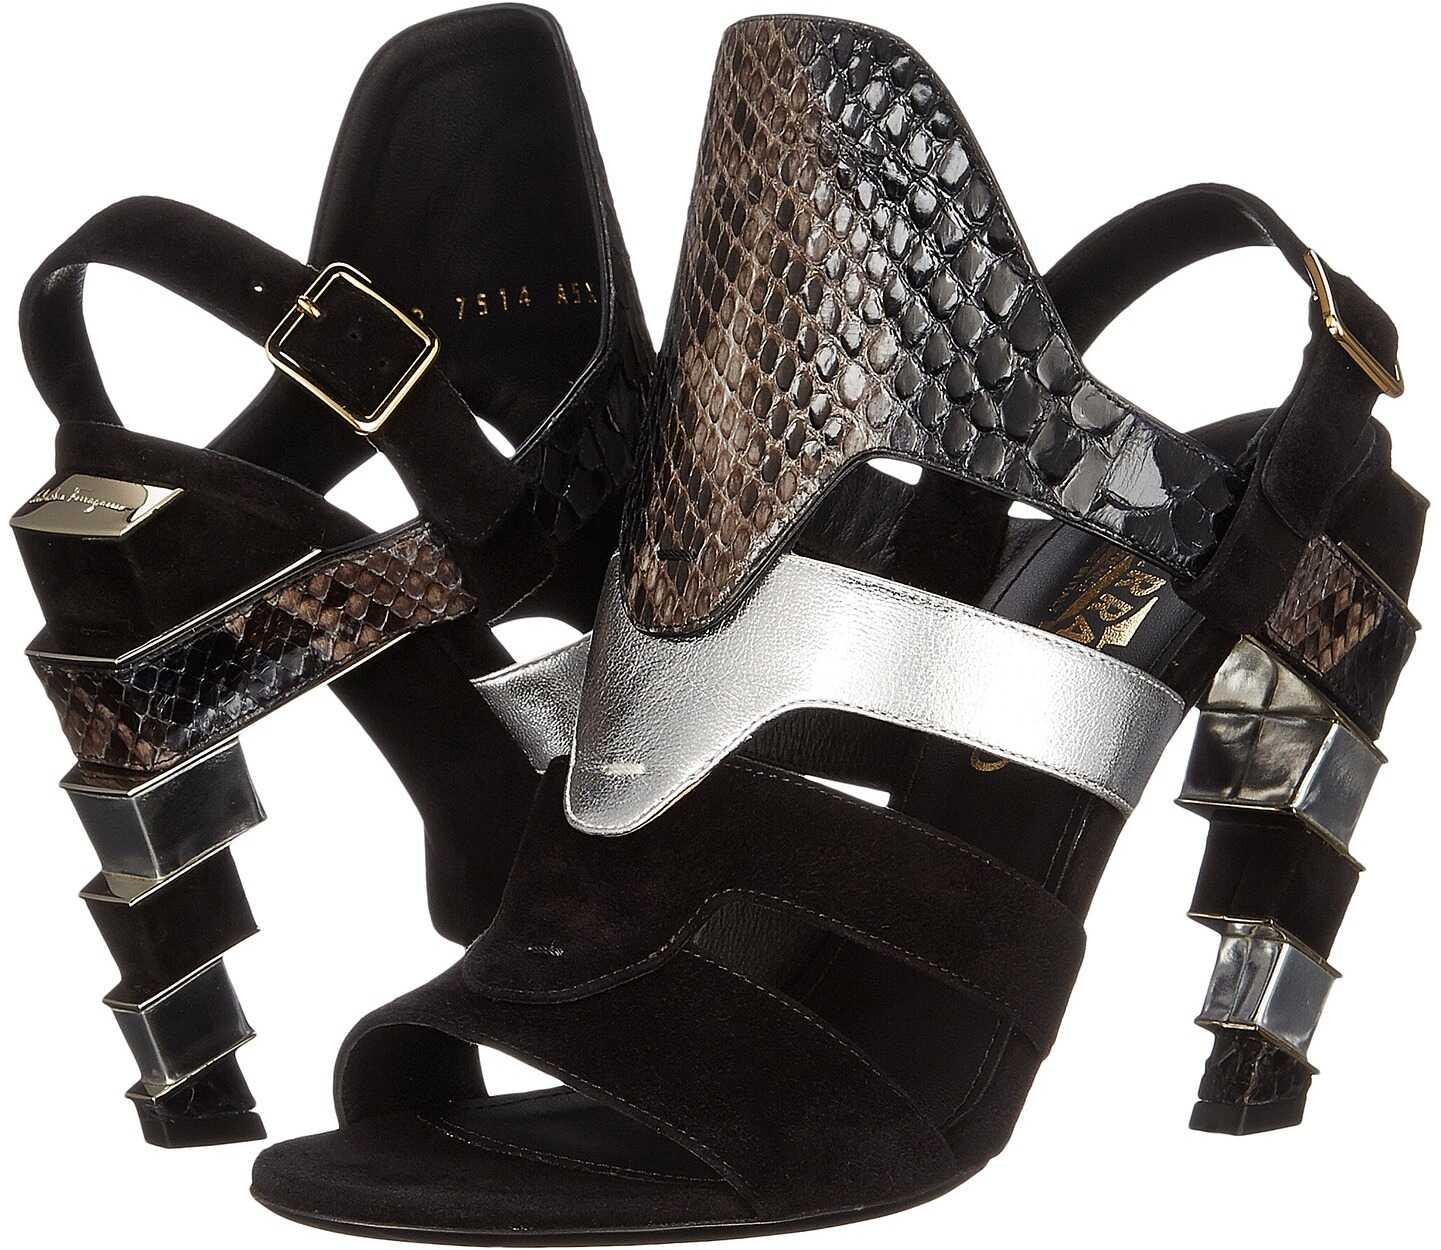 Salvatore Ferragamo Suede and Calfskin Sandal With Heel Nero Suede Calf